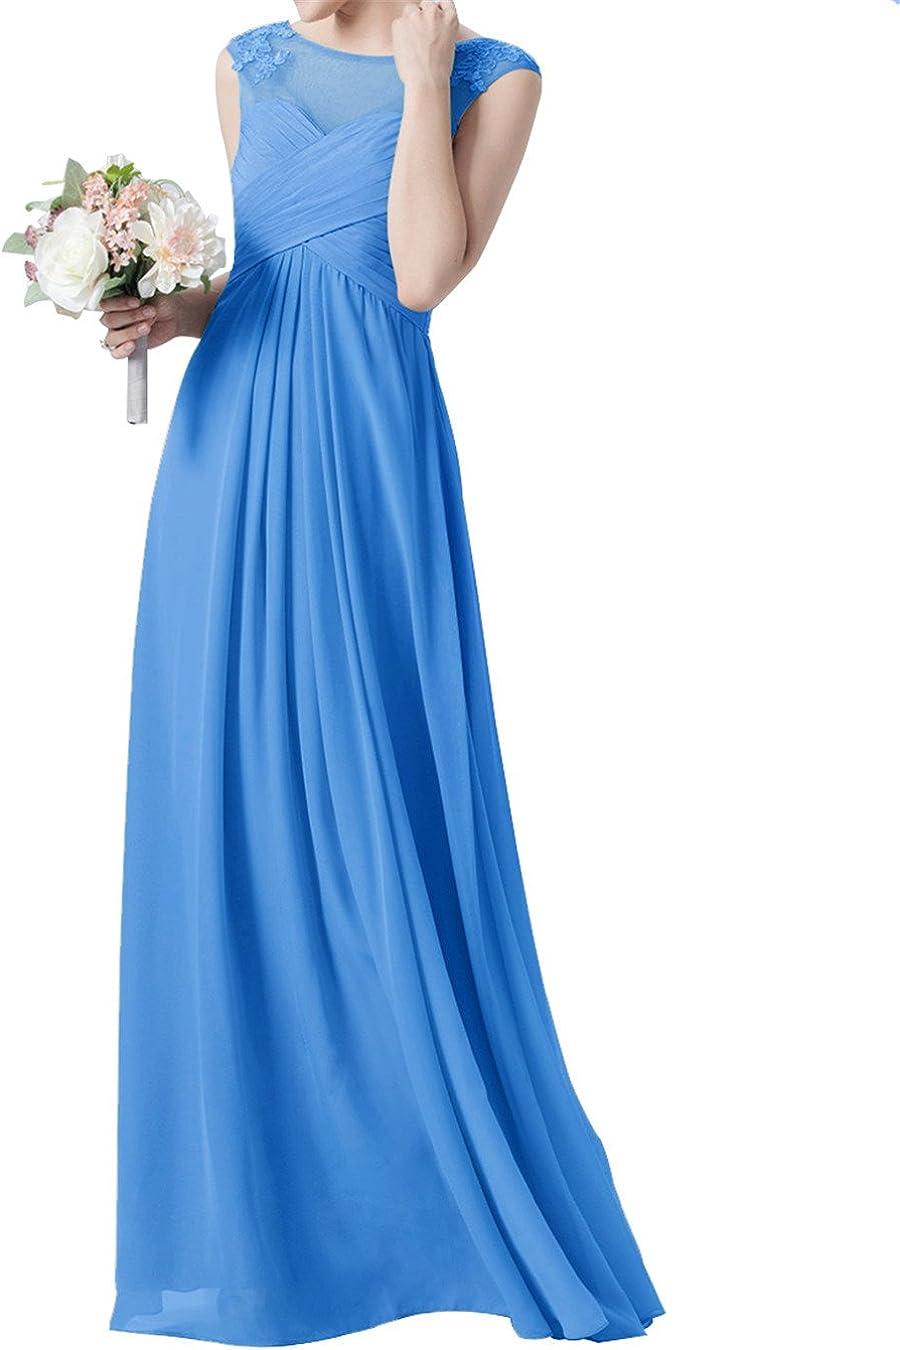 Applique Bridesmaid Dresses for Women Chiffon Scoop Neck Modest Evening Party Gown